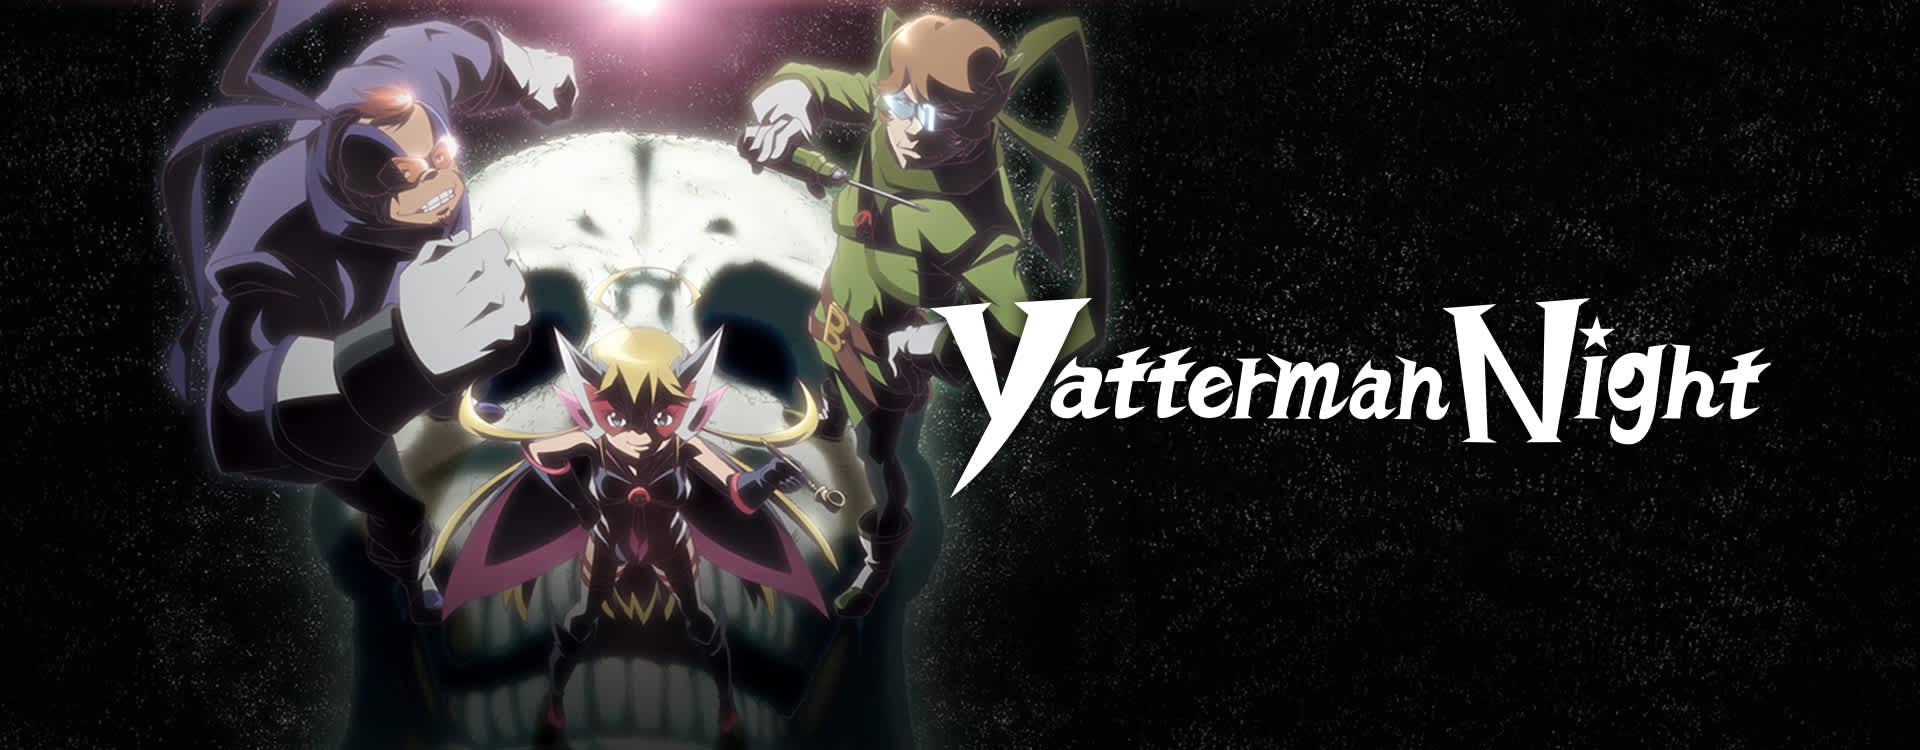 Yatterman Night